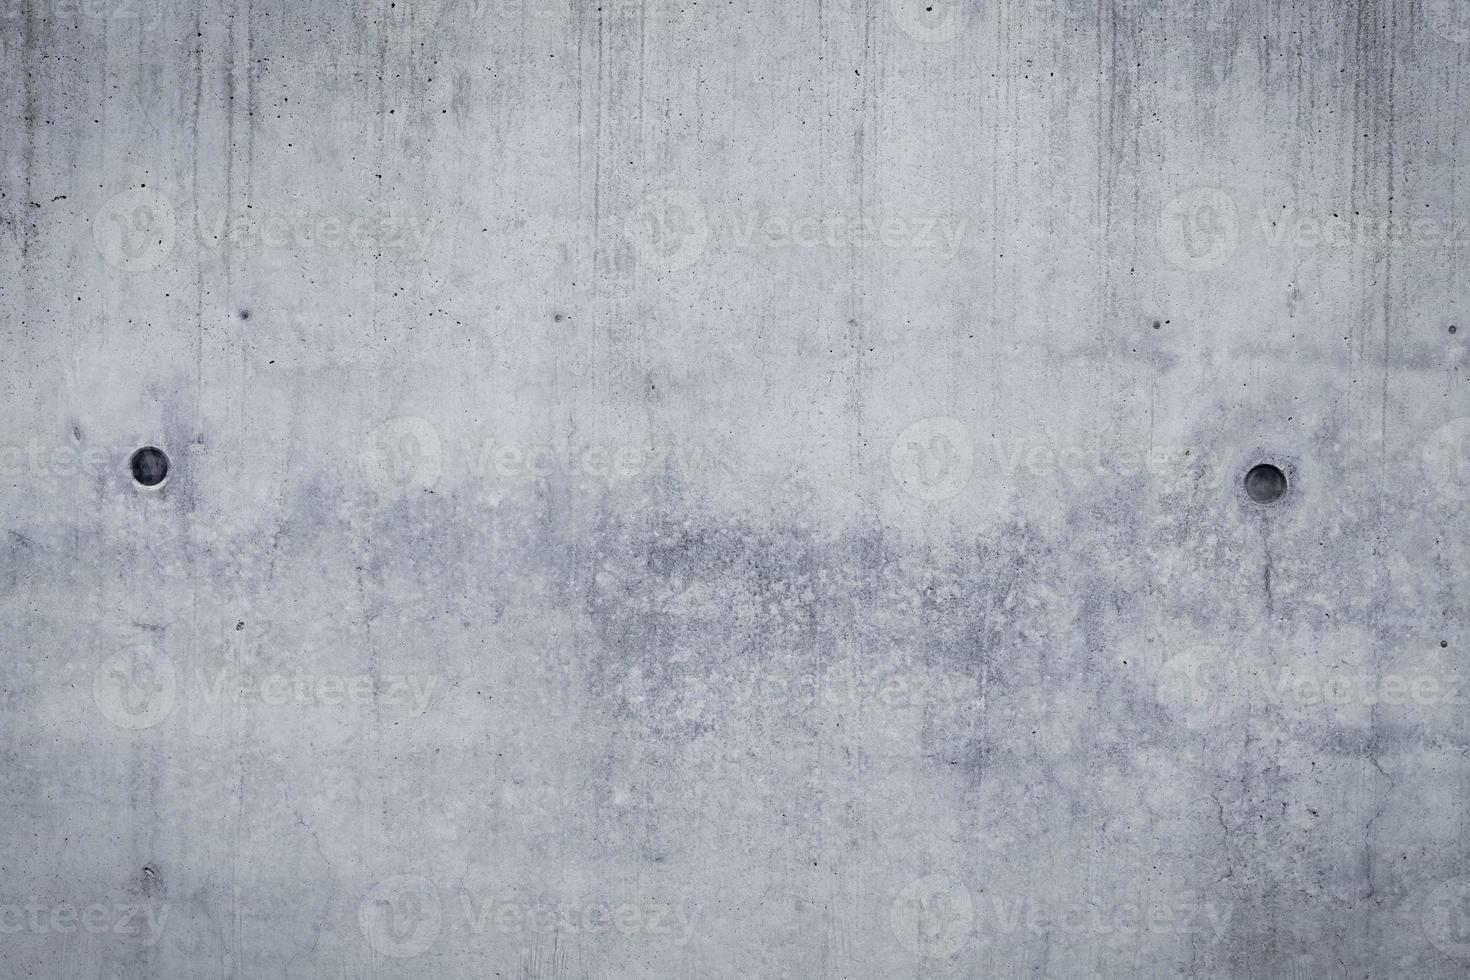 grungy Betonwand Textur foto